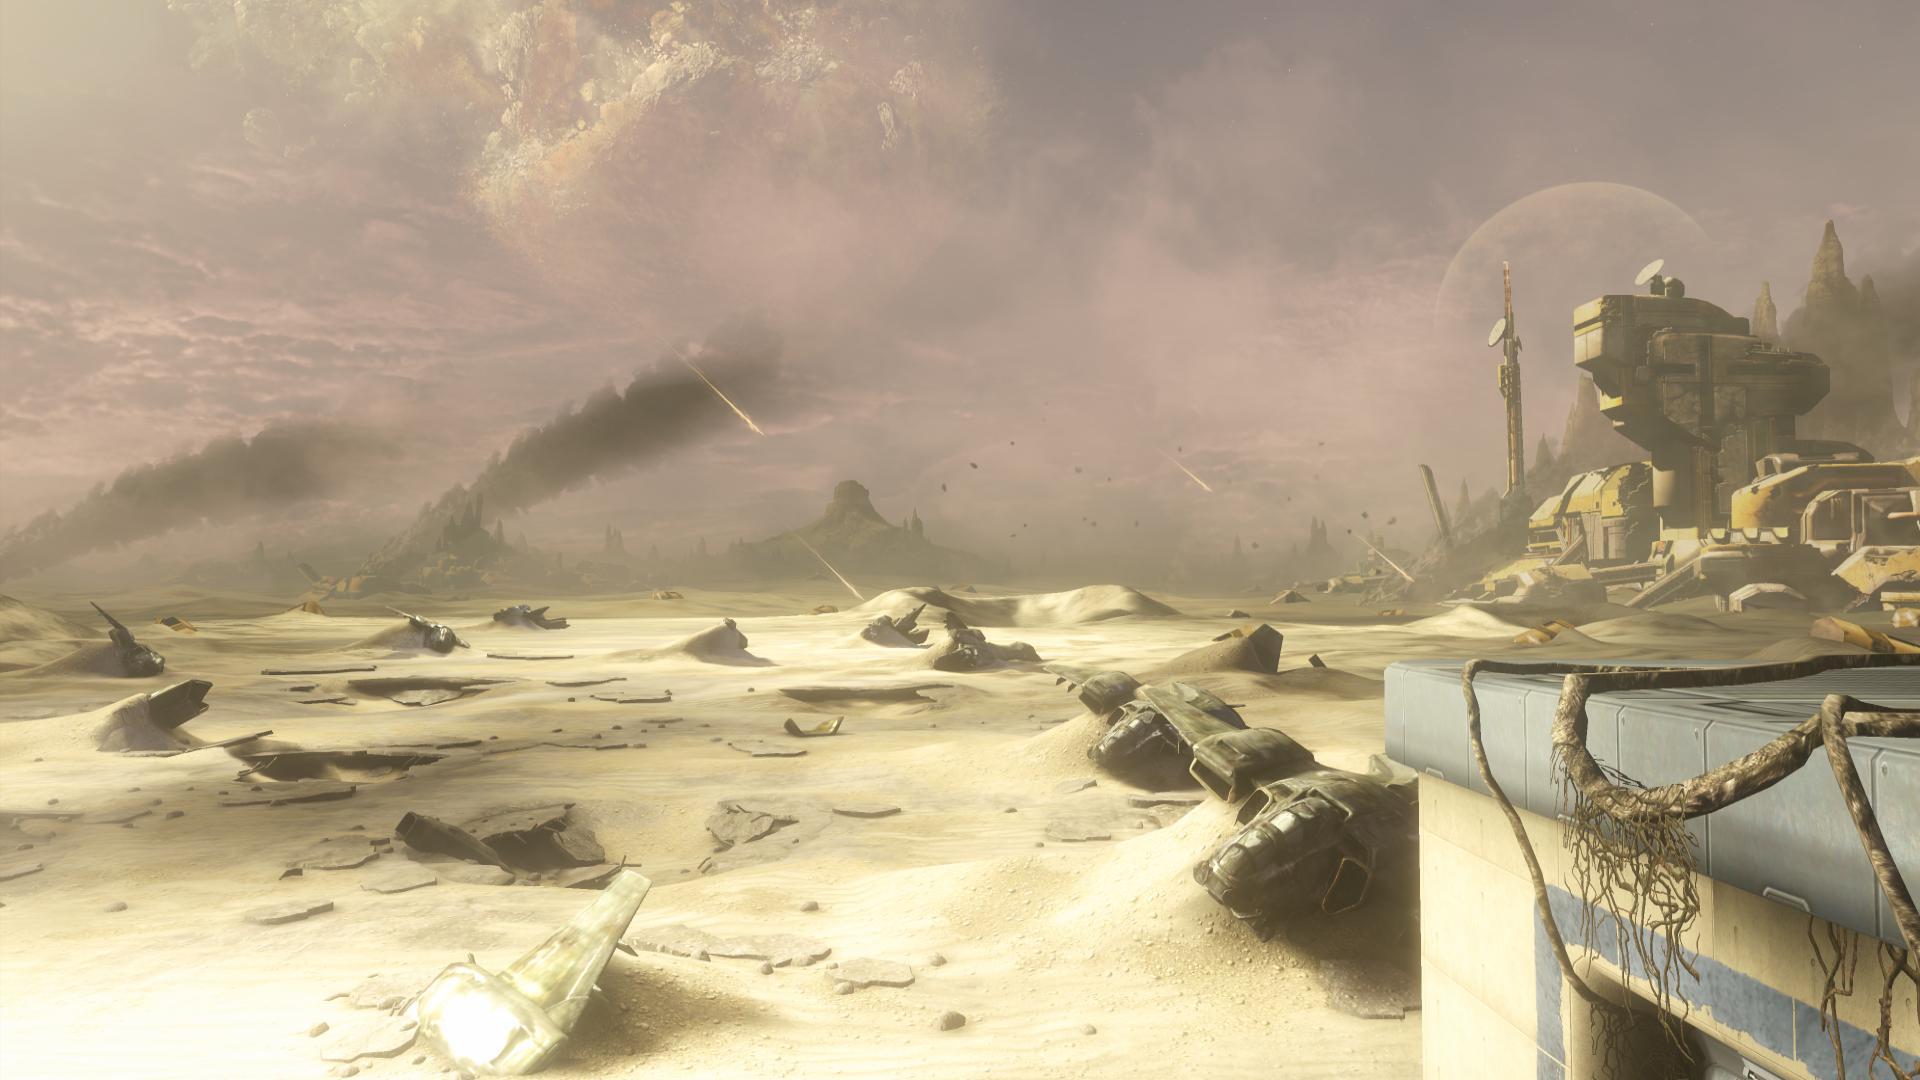 The ghost battlefield. by GhostHuckebein